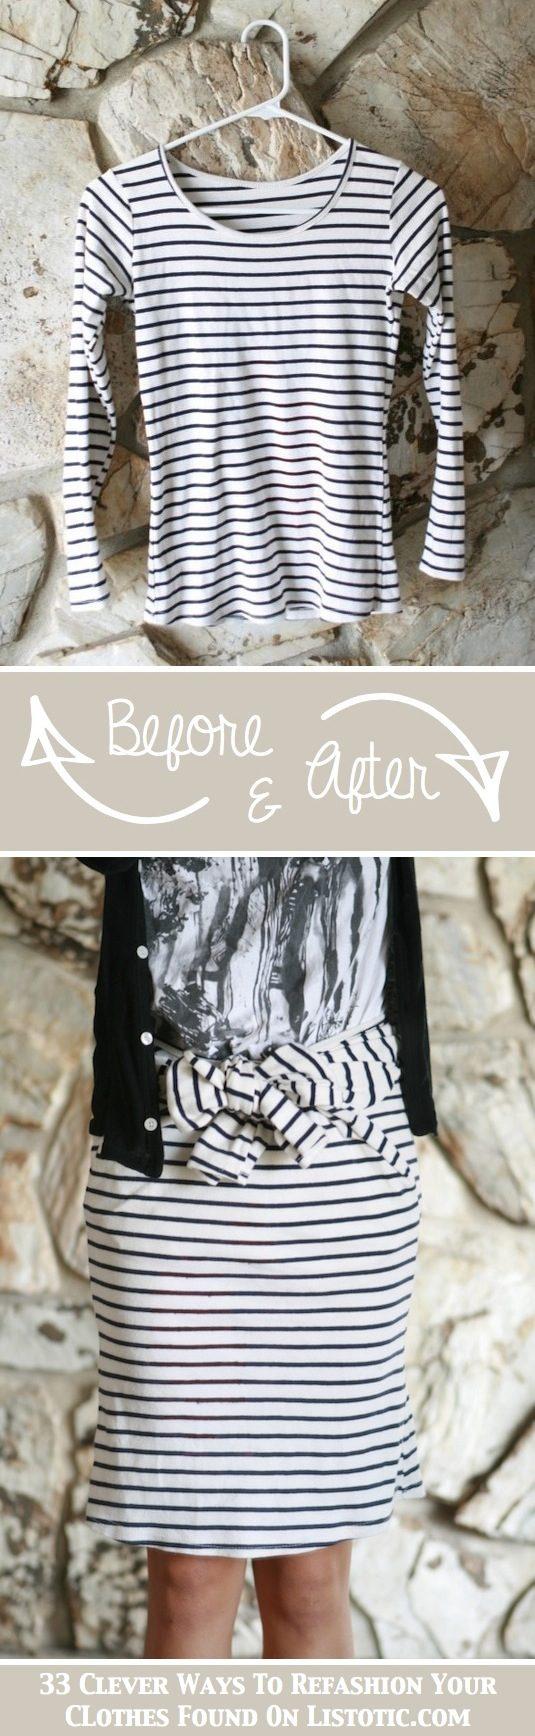 tutoriale_fashion_24